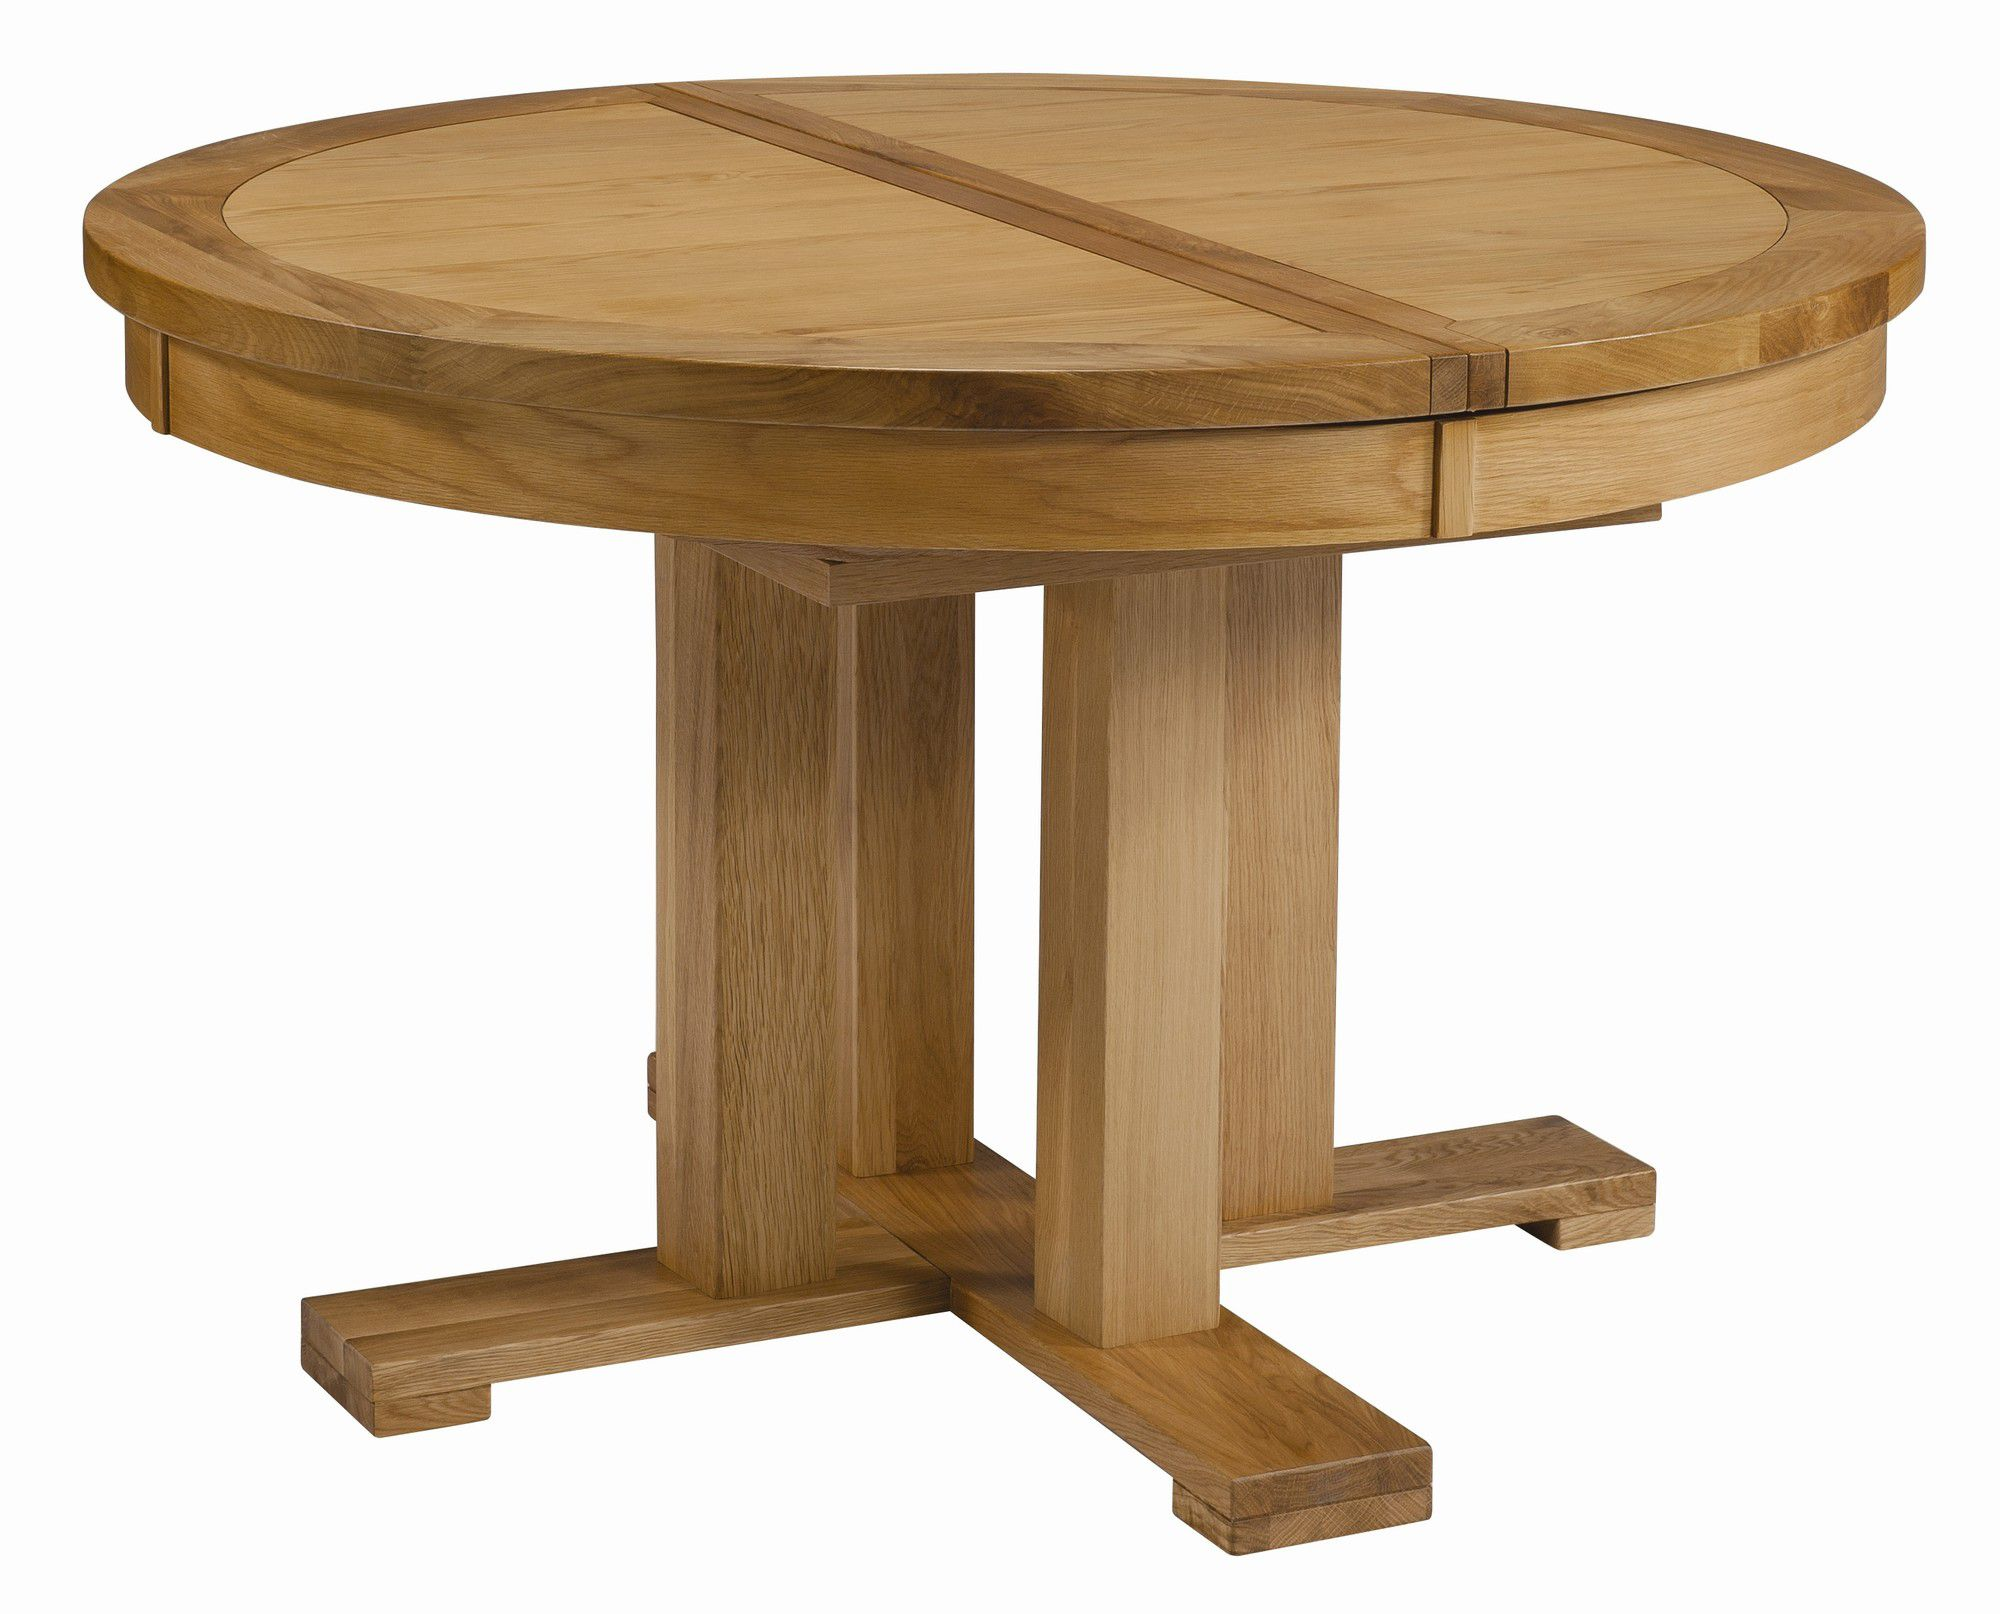 Extending Table 187 Tesco Extending Tables : 625 5533PI1000015MNwid2000amphei2000 from extendingtable.co.uk size 2000 x 2000 jpeg 230kB